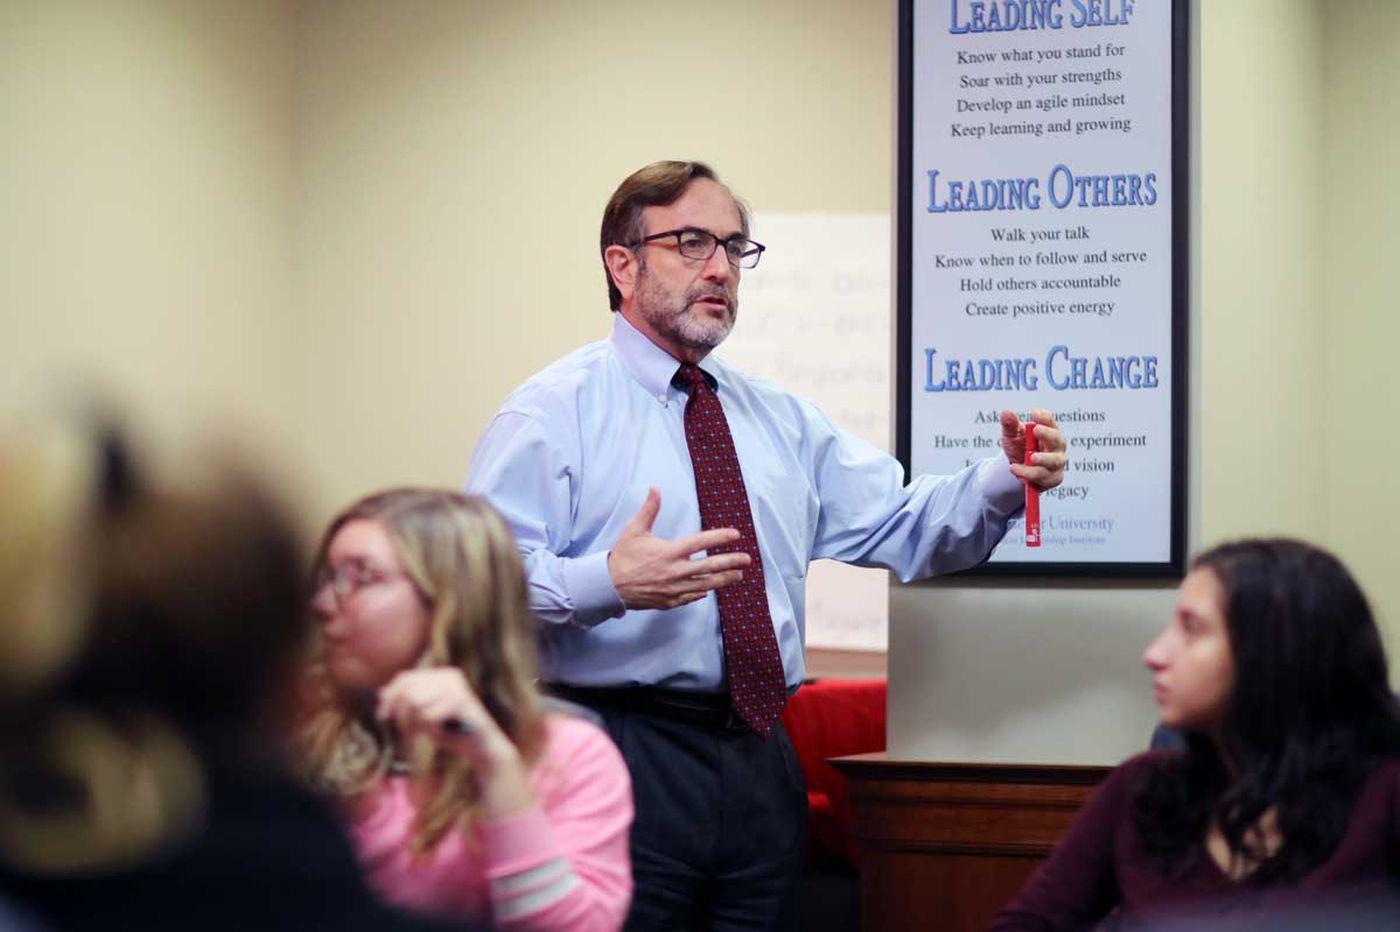 At Widener, leadership is for everyone